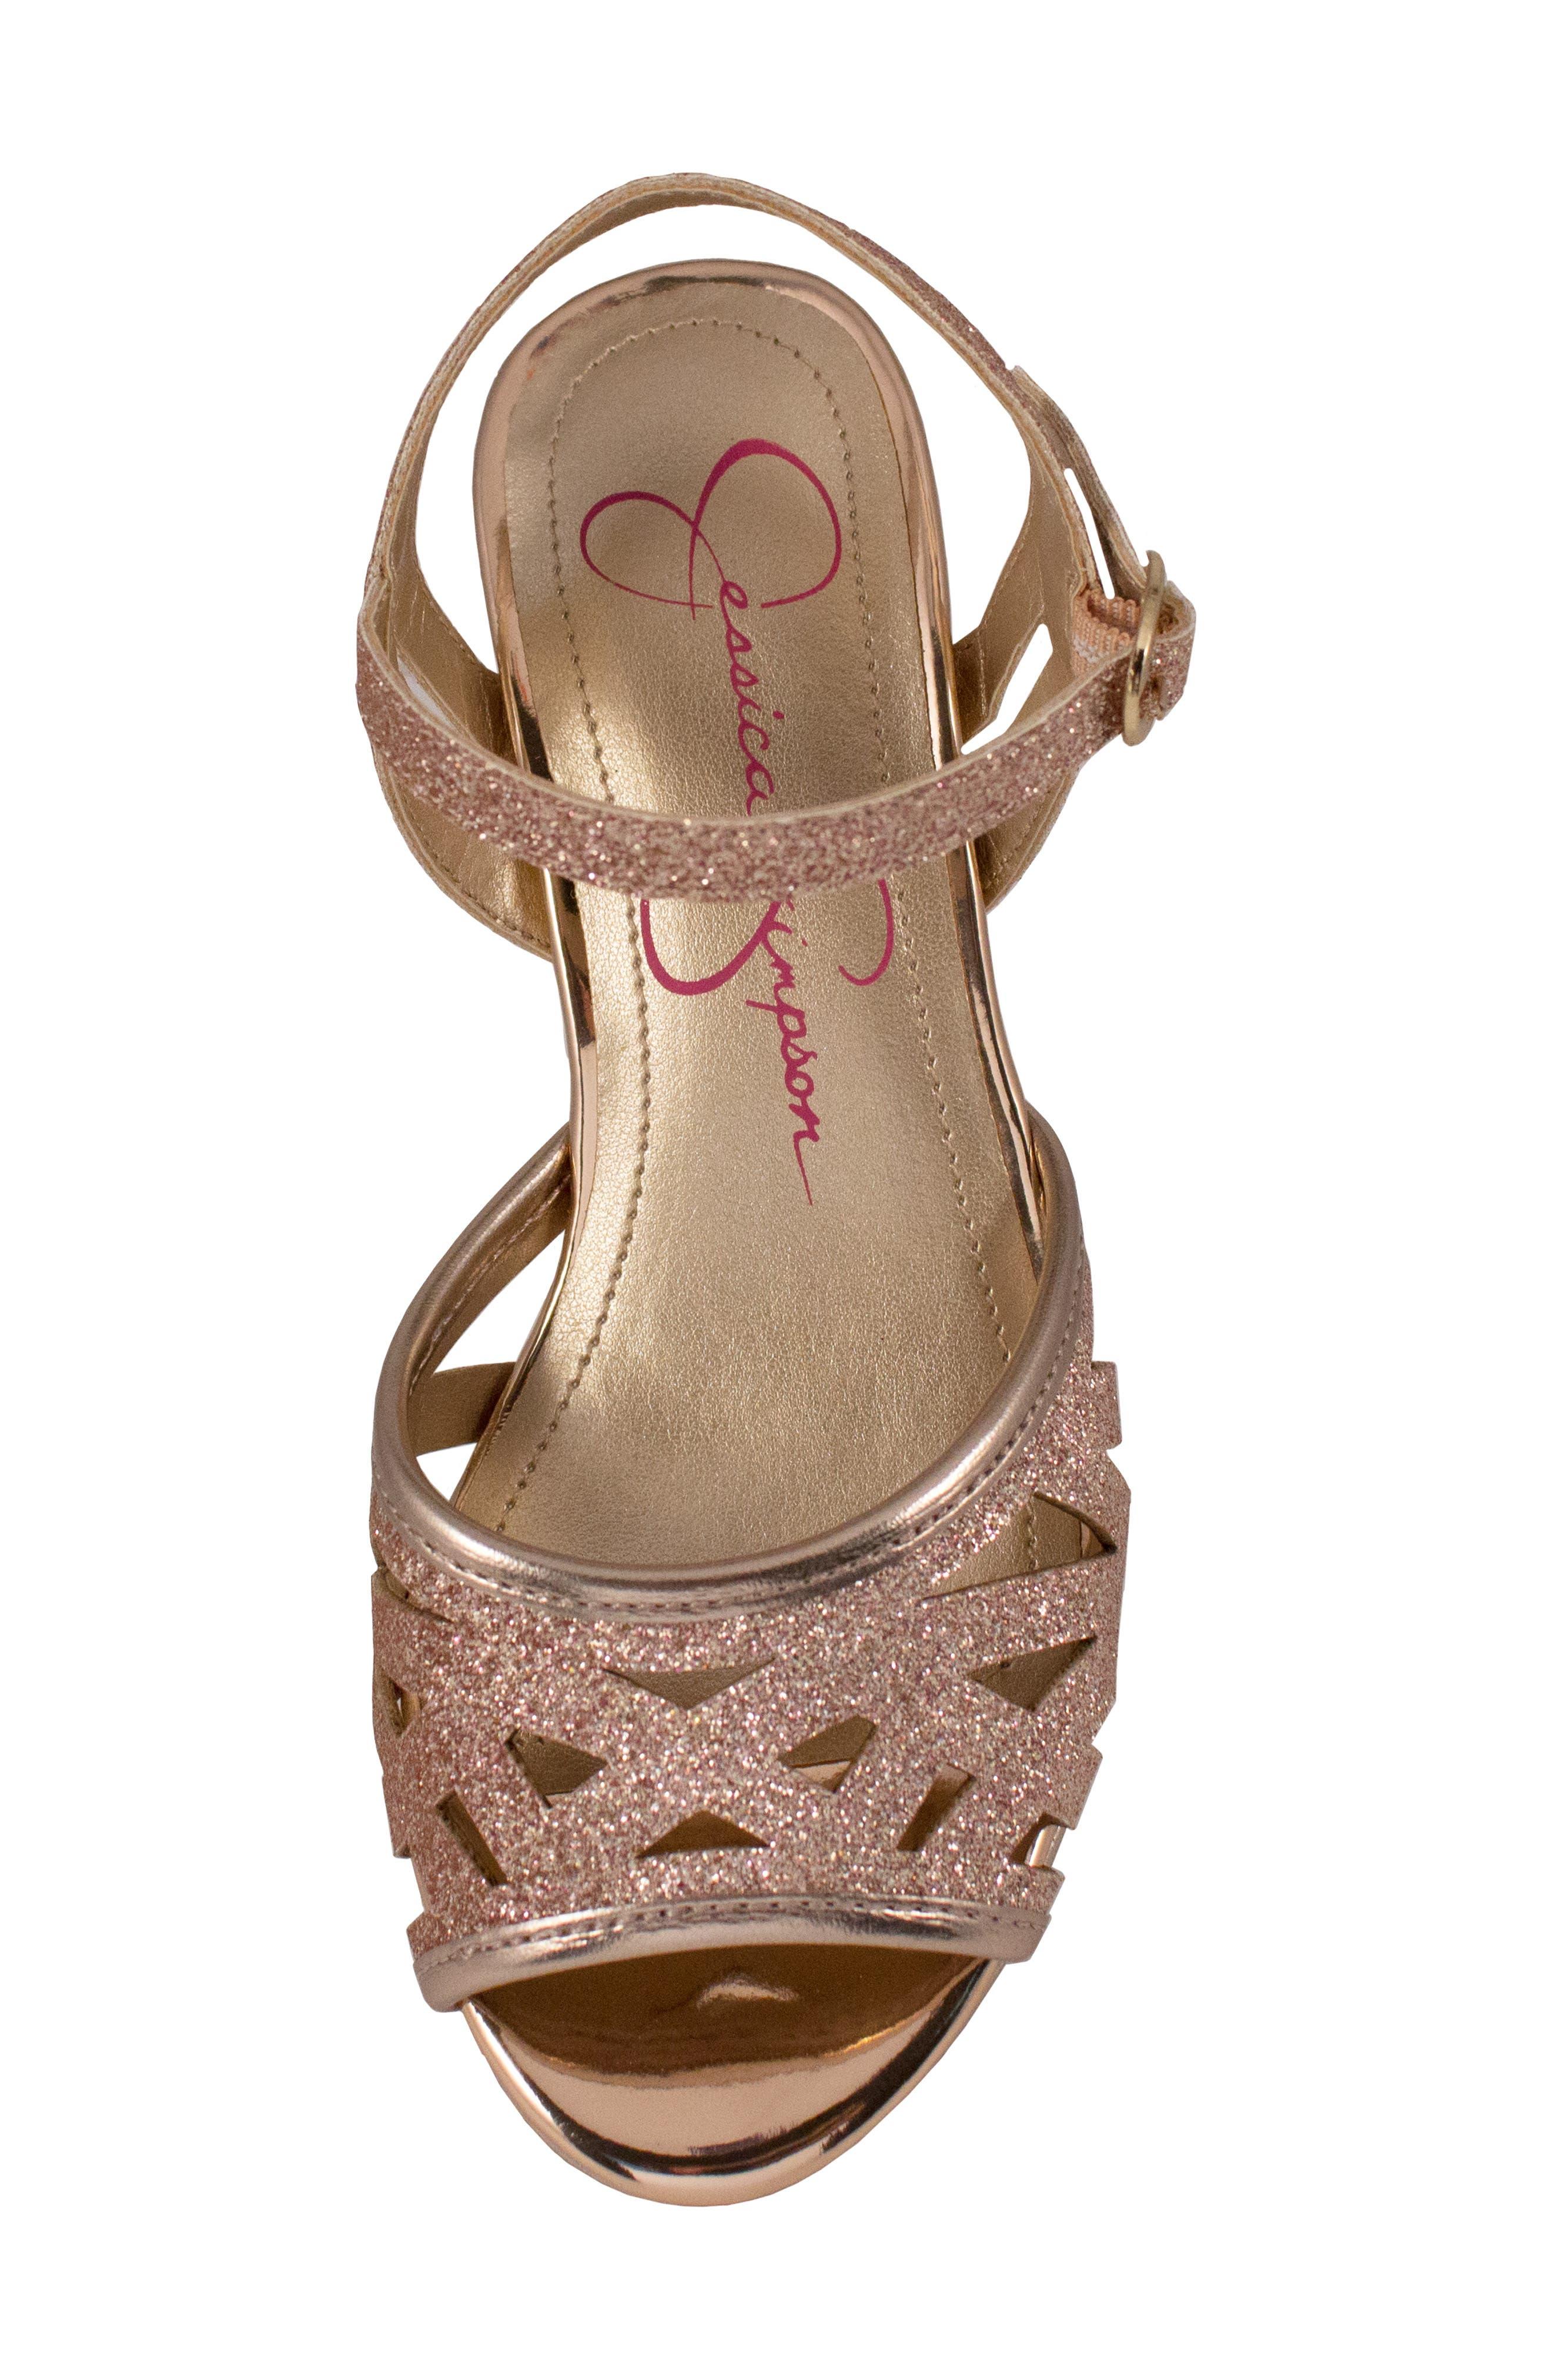 JESSICA SIMPSON,                             Glitter Sandal,                             Alternate thumbnail 5, color,                             ROSE GOLD